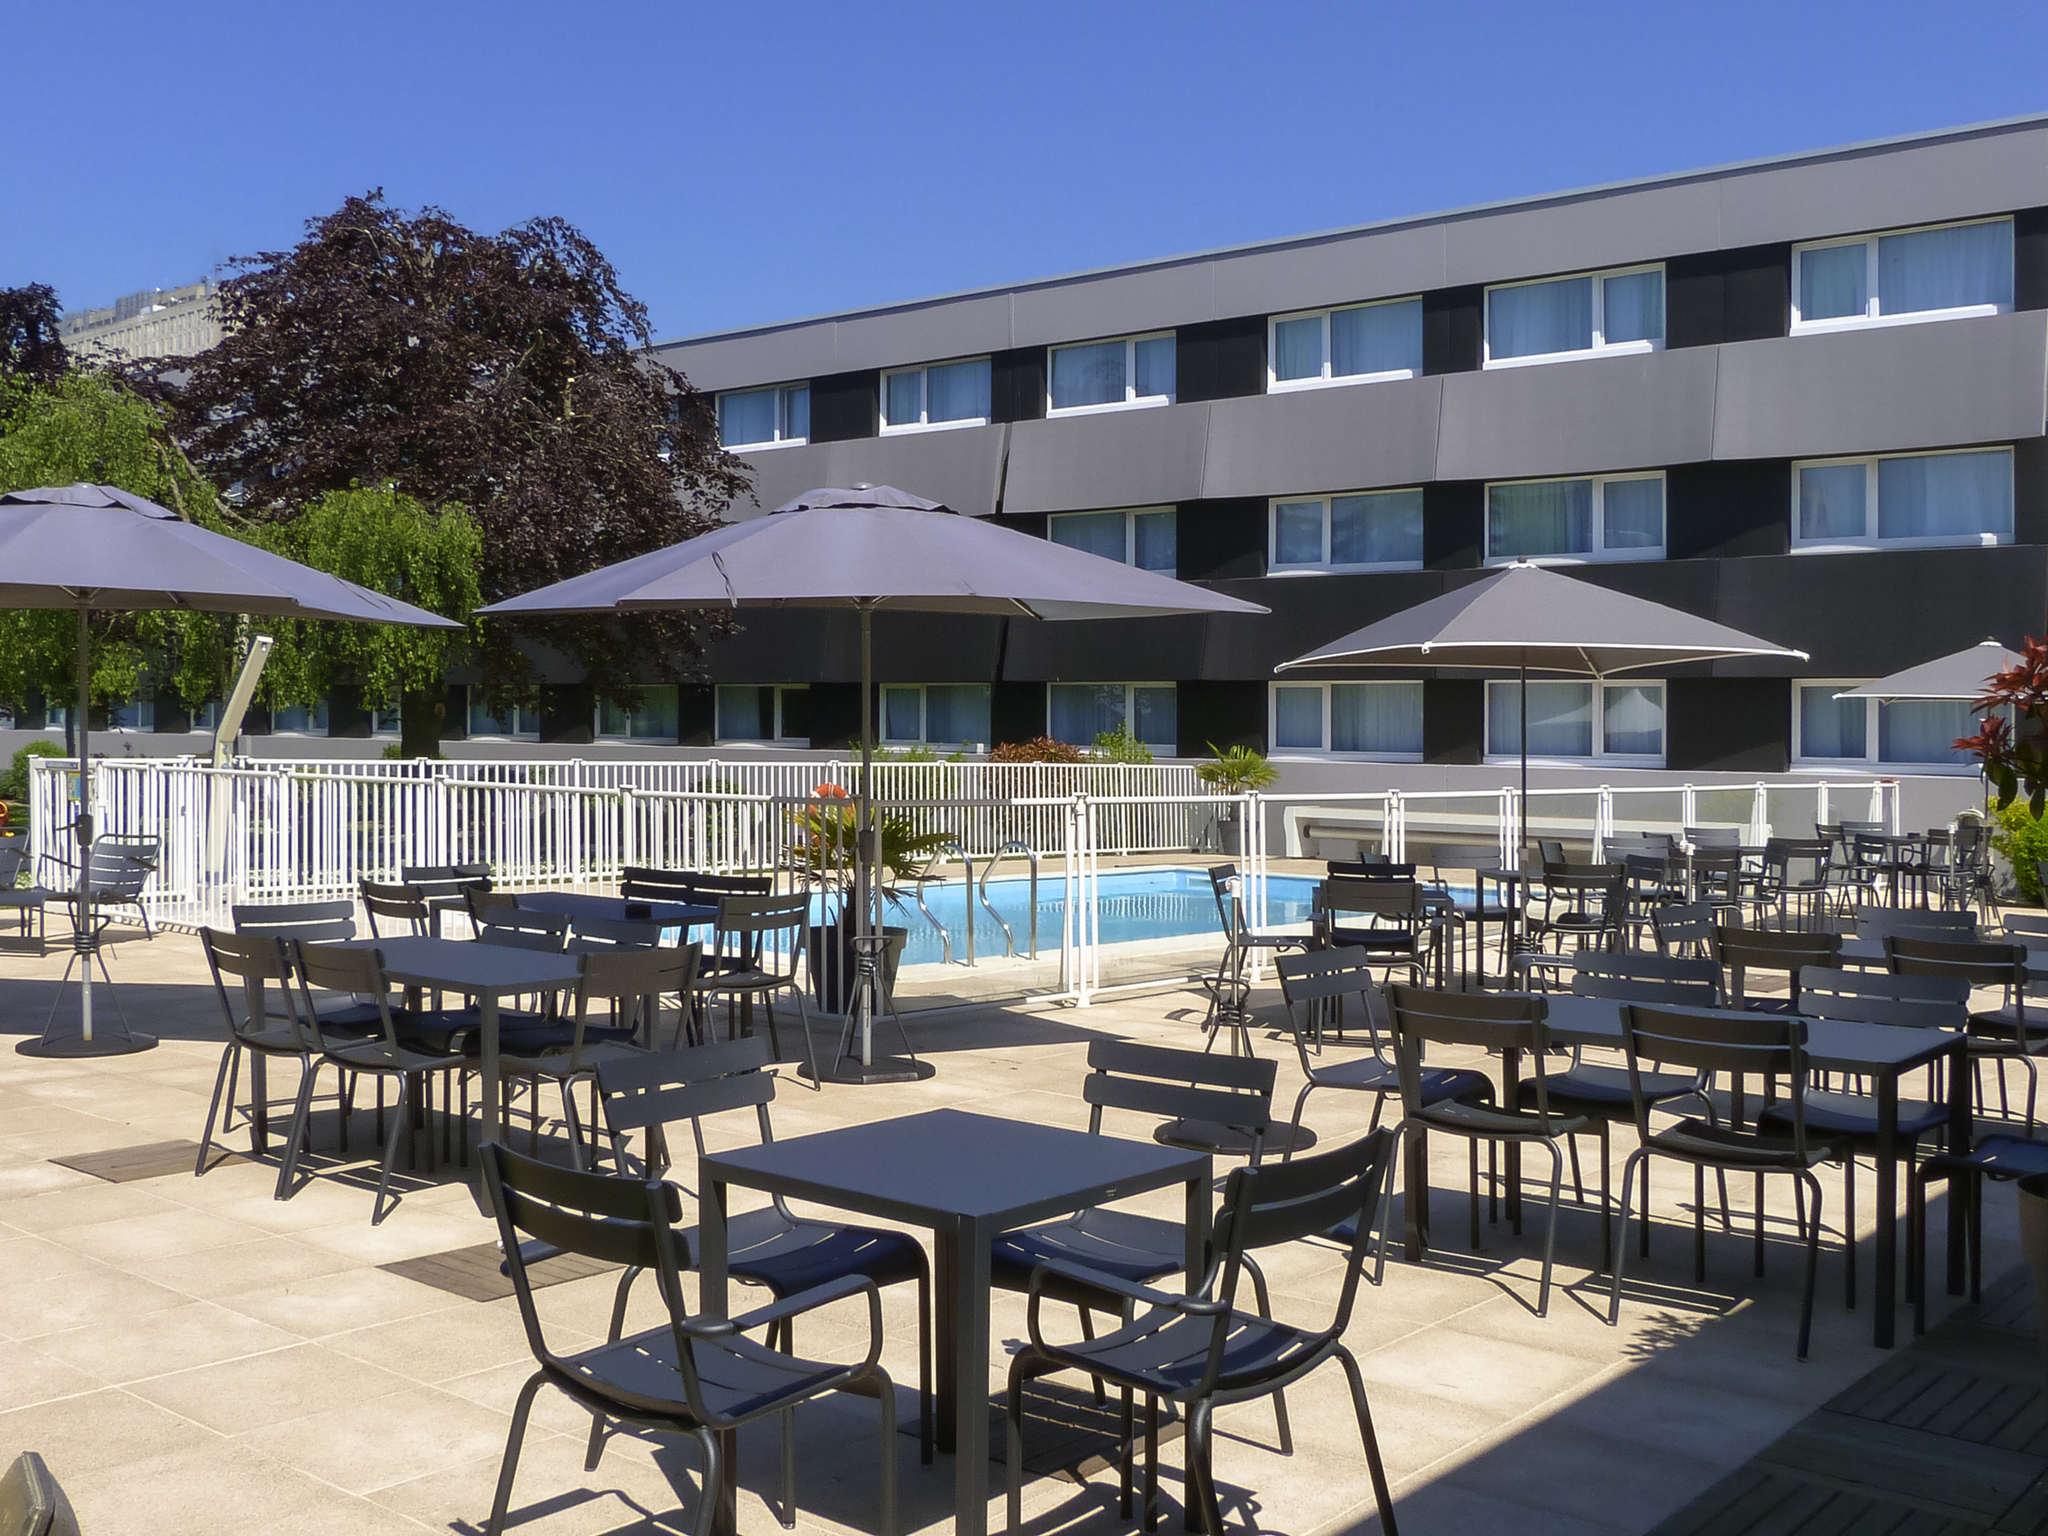 Hotell – Novotel Caen Côte de Nacre